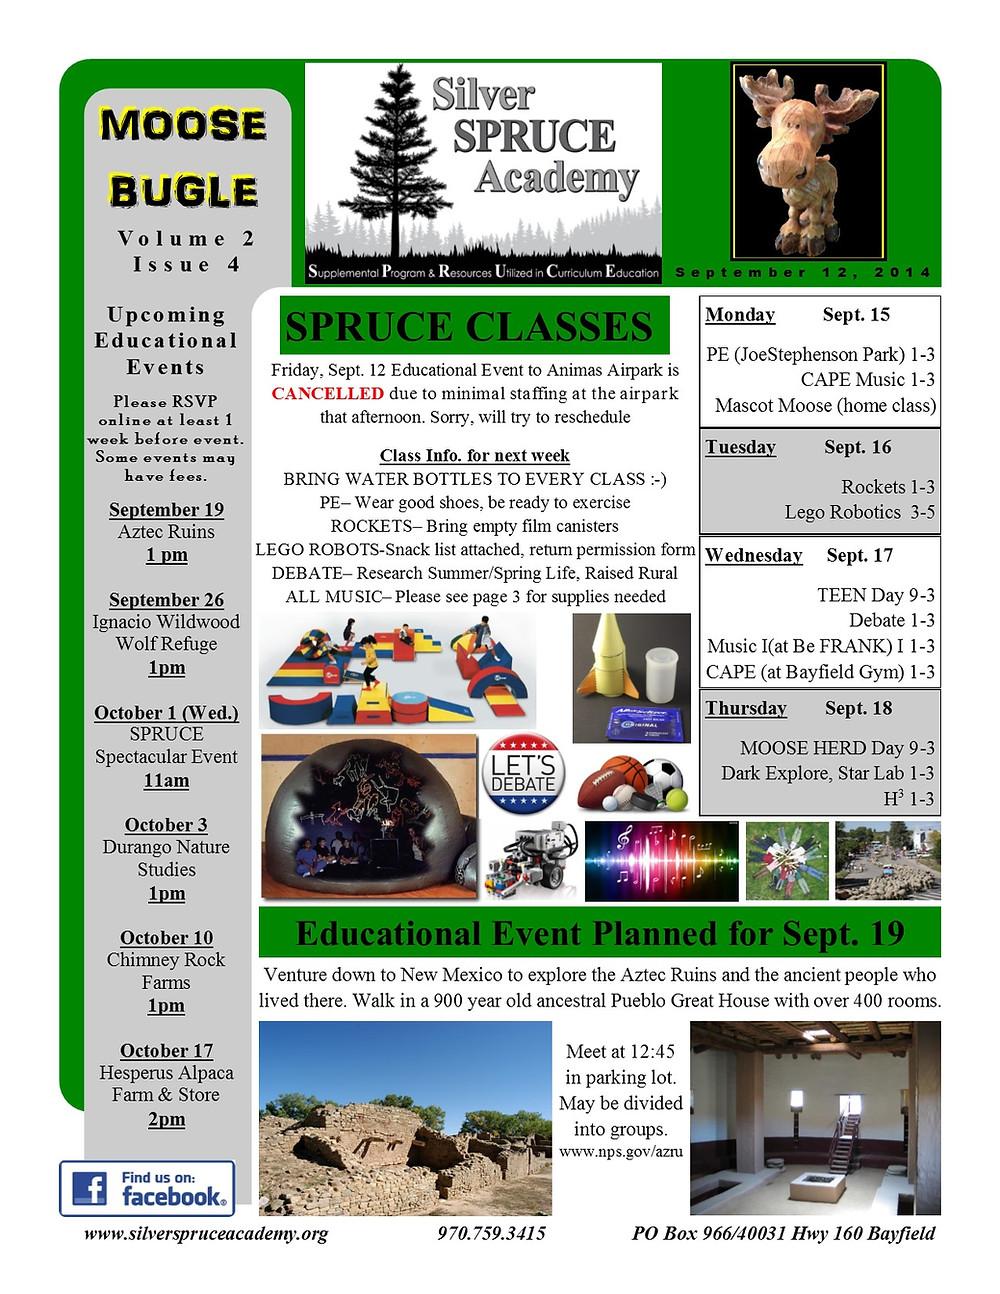 Moose Bugle 9-12-14 Page 1.jpg